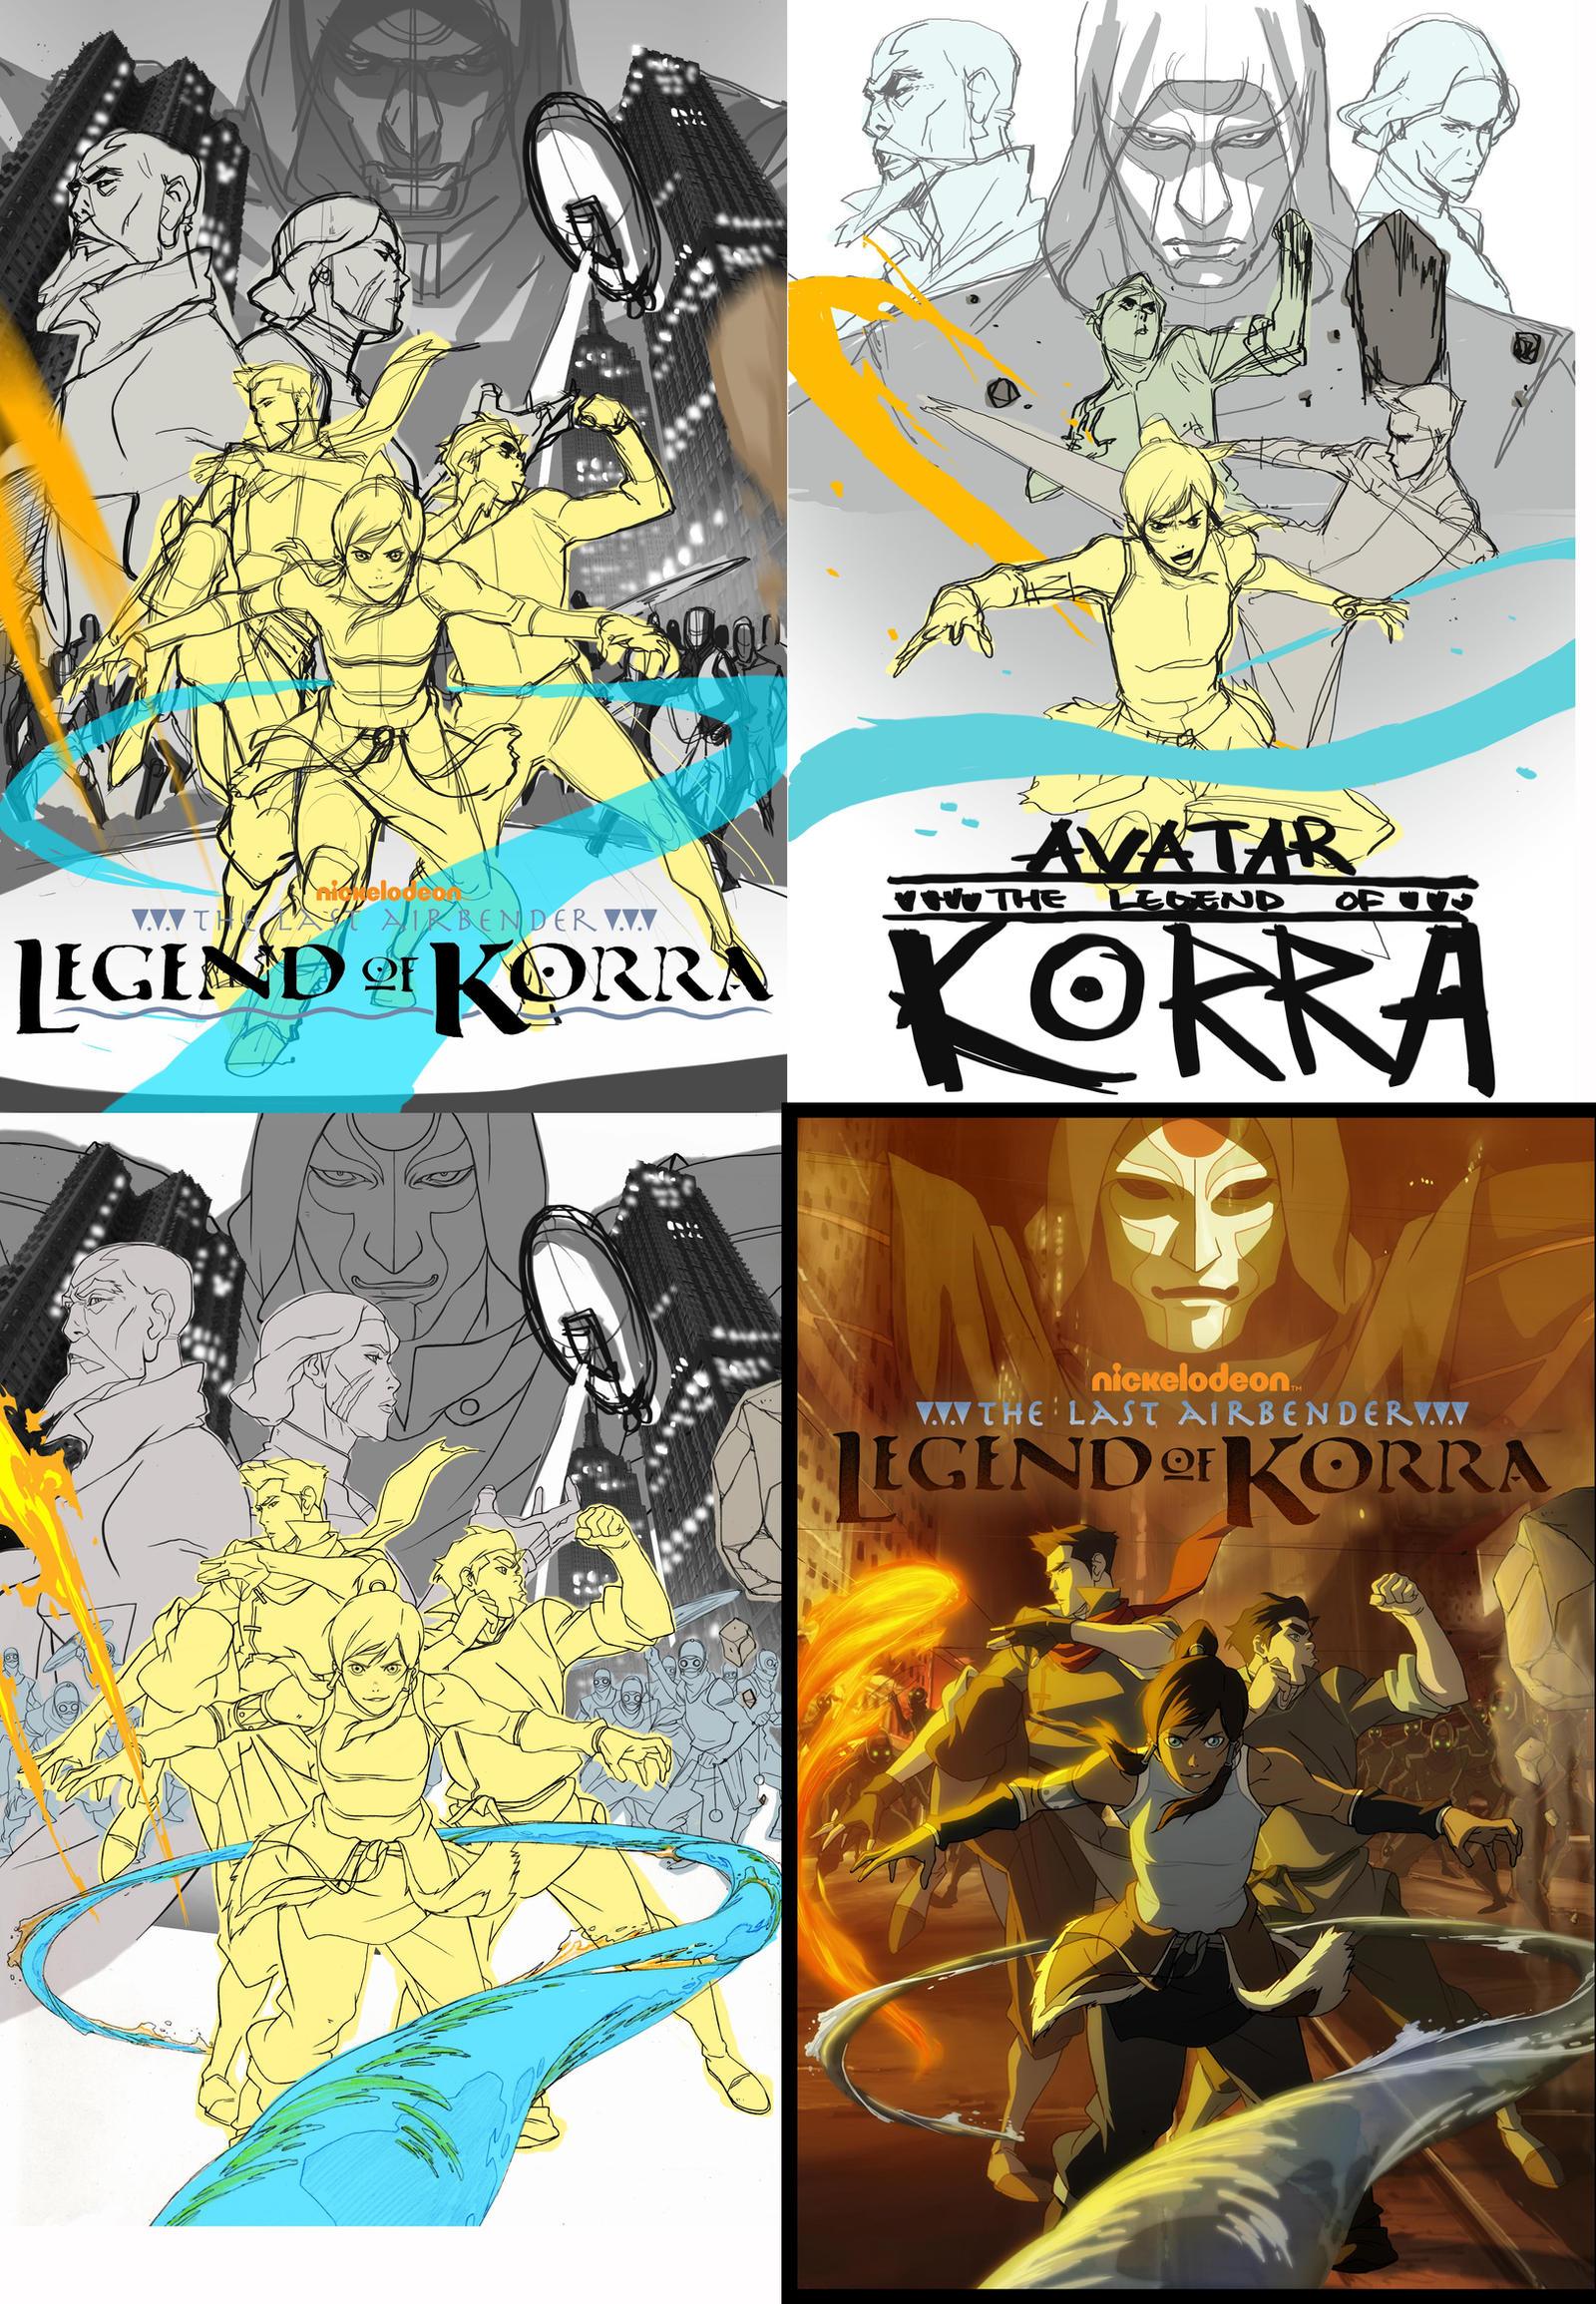 korra poster by blacksataguni